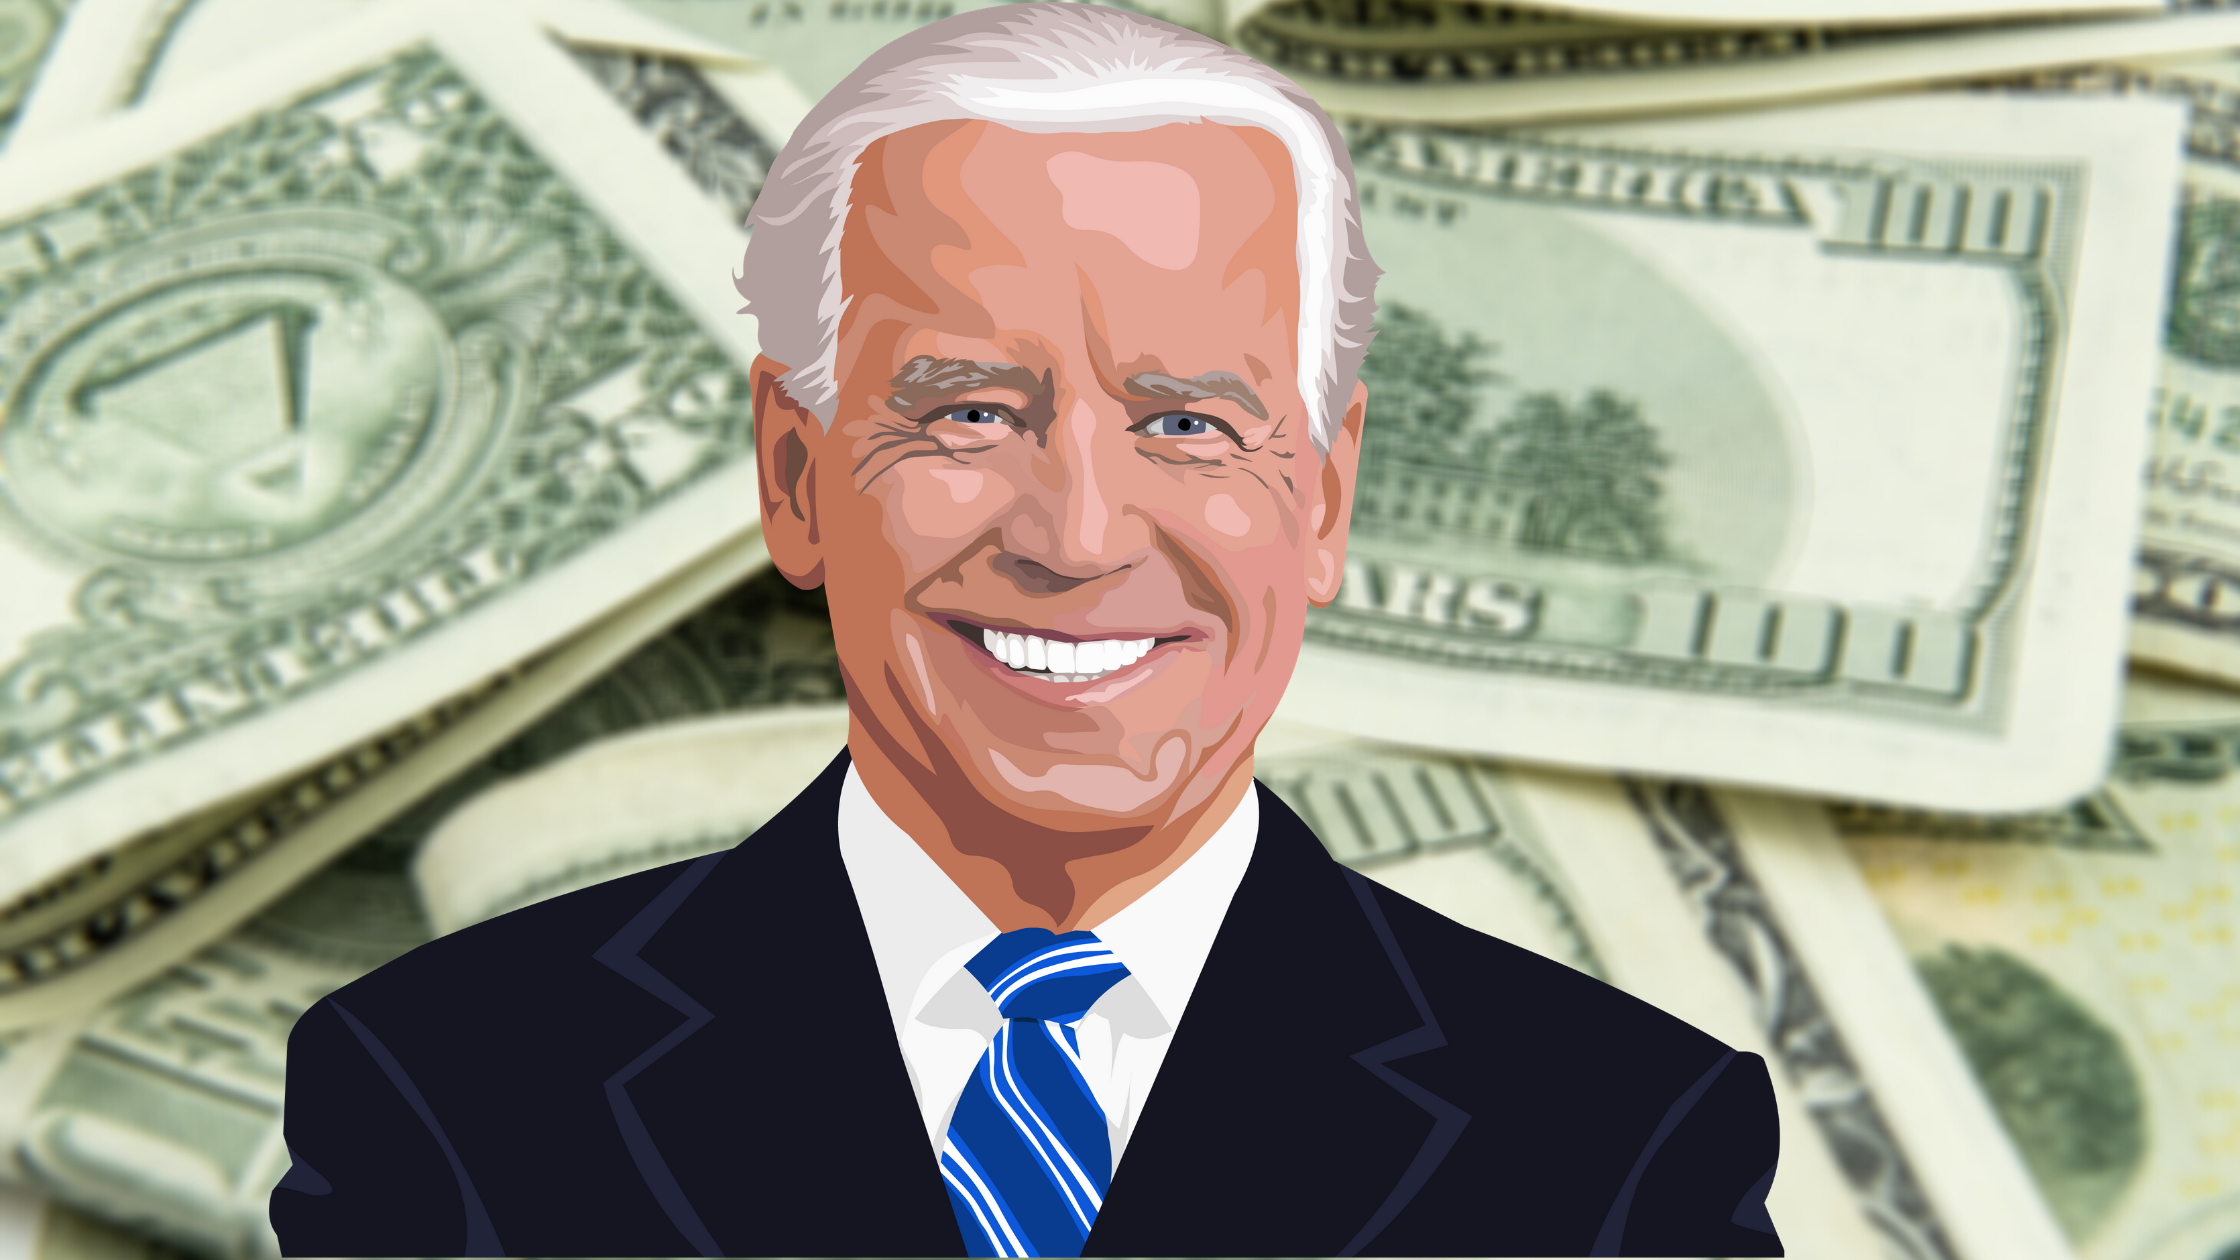 Joe Biden Just Made COVID Stimulus a Race Issue